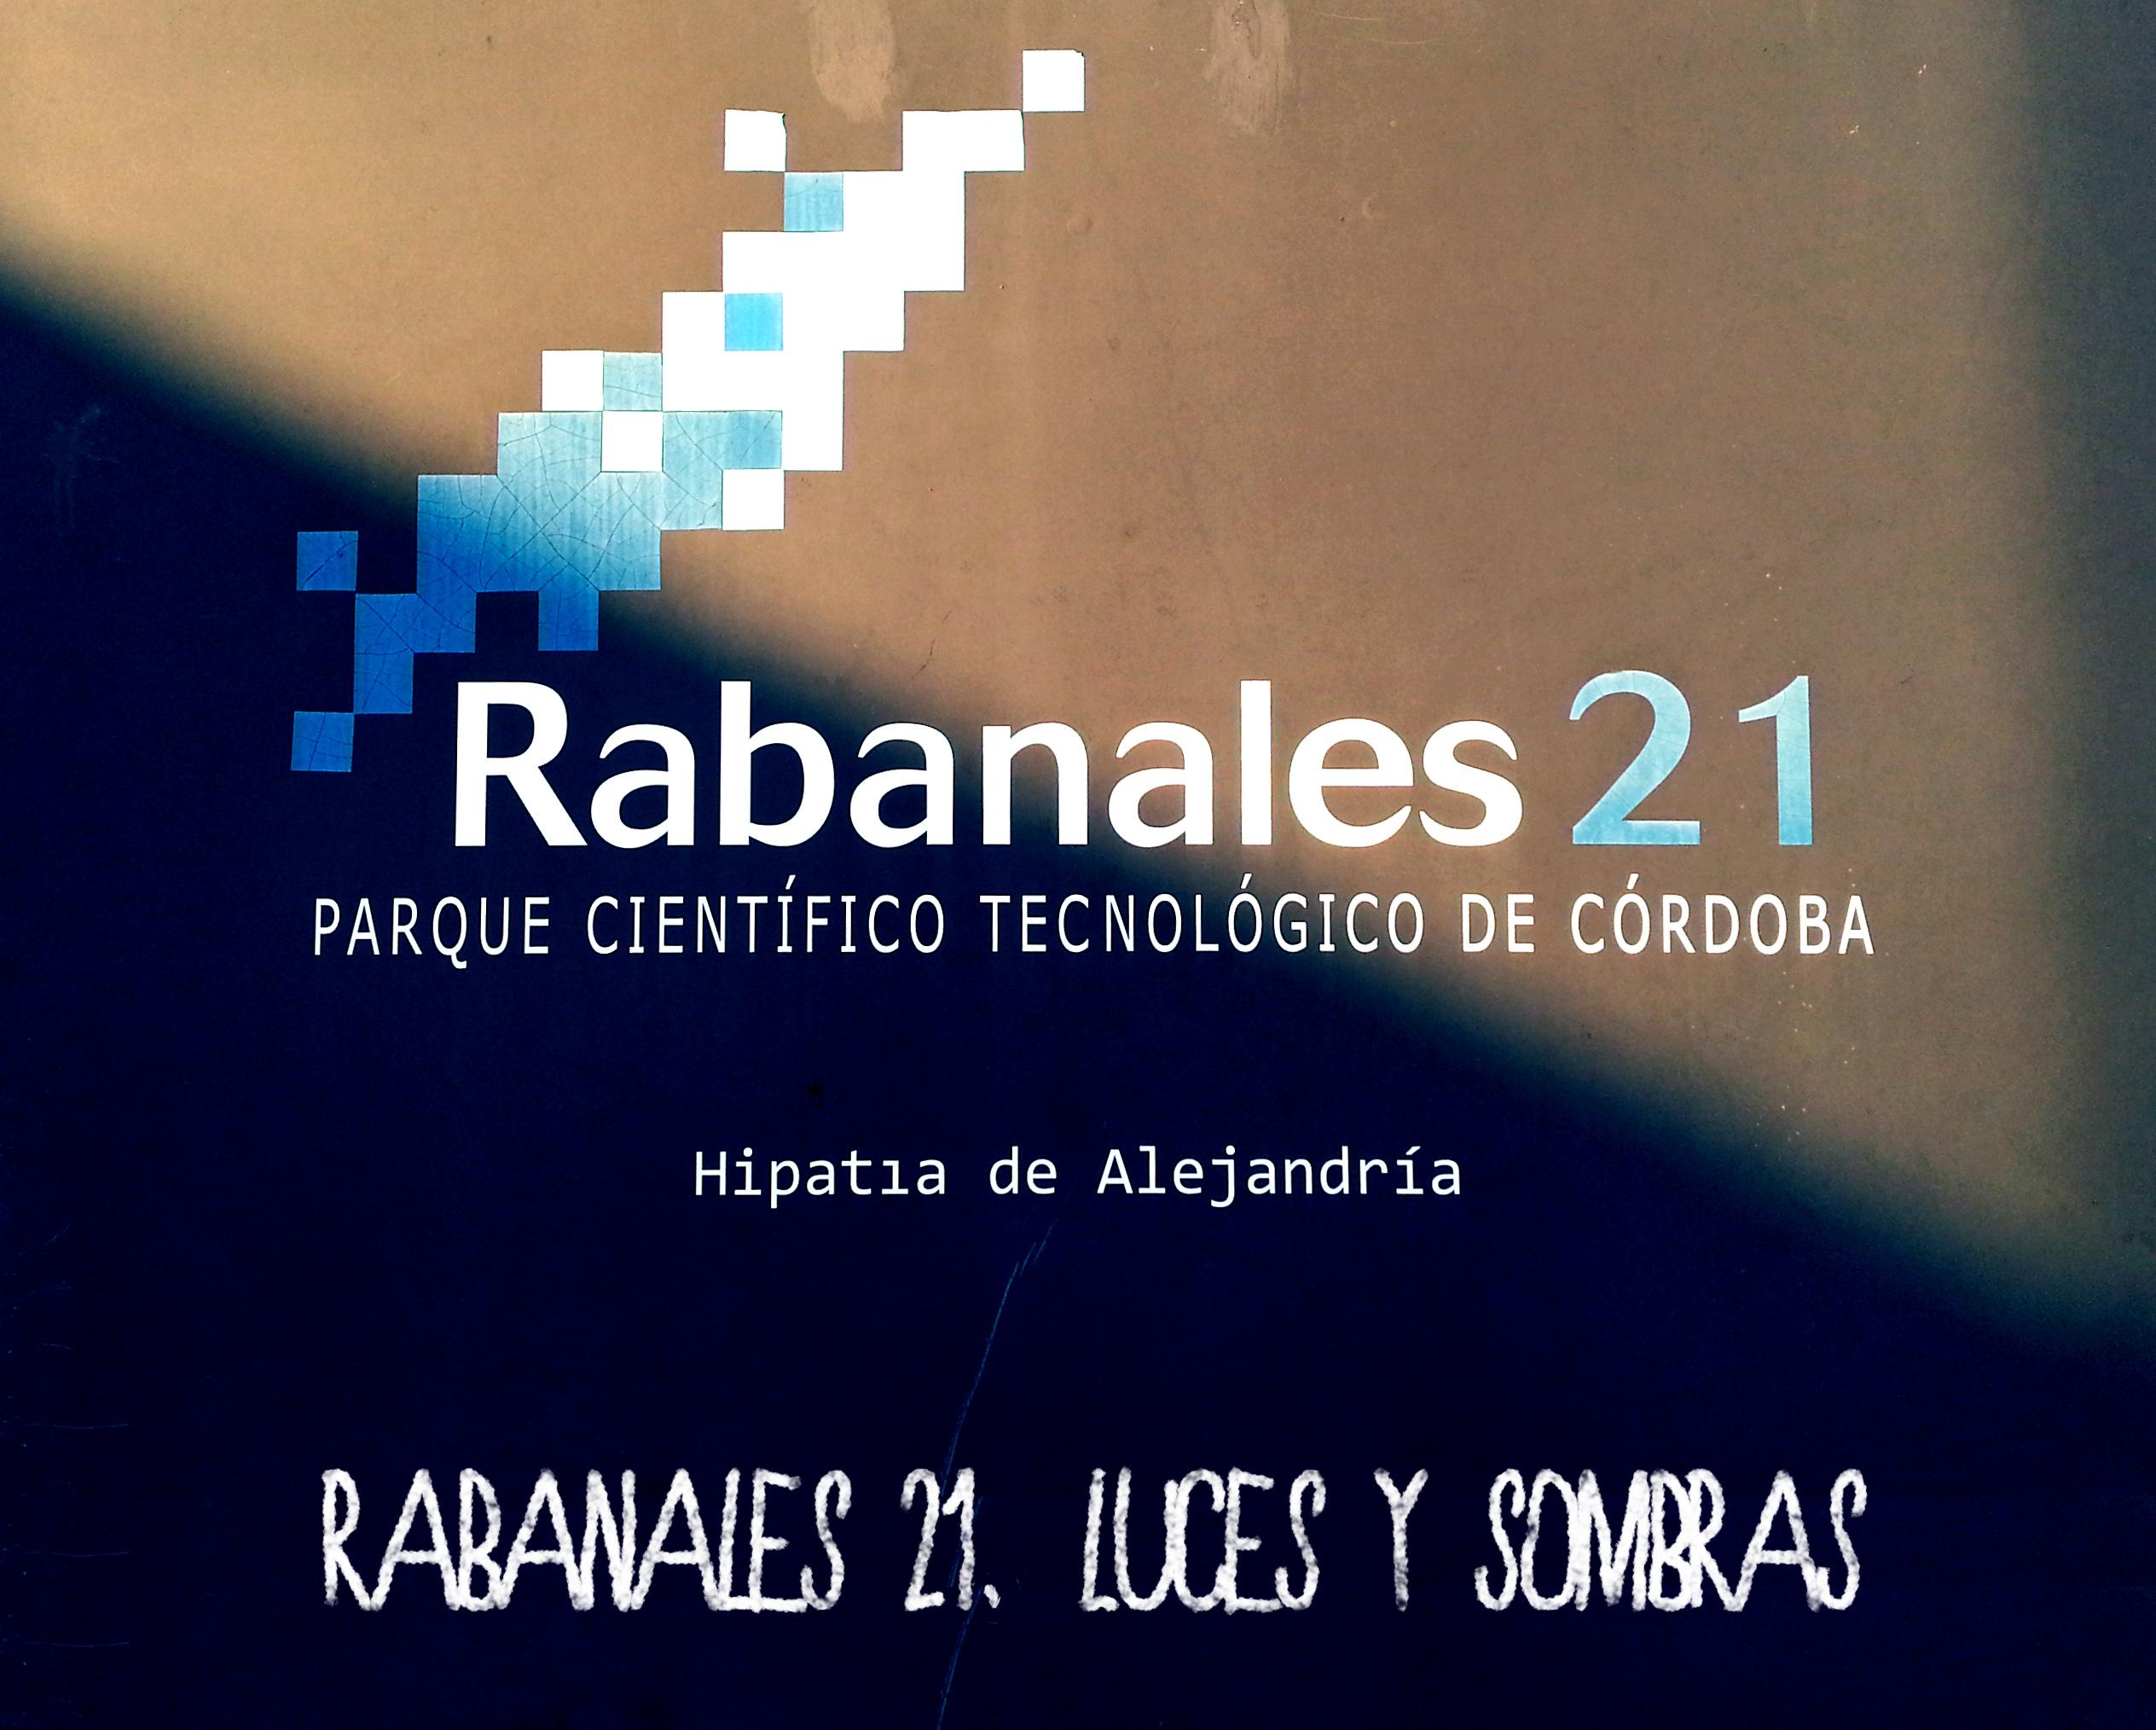 Rabanales 21, luces y sombras